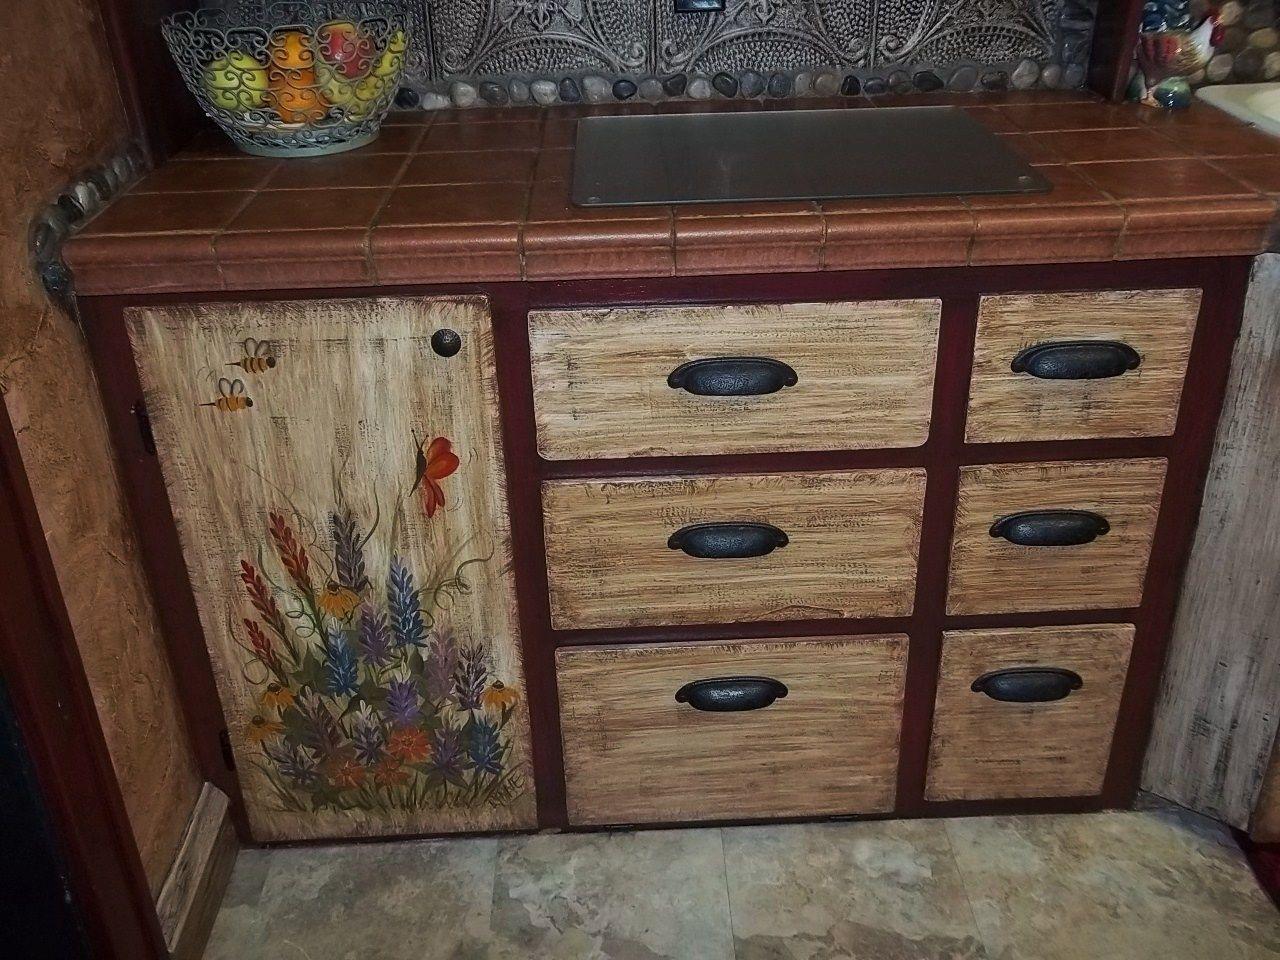 Bottom Half Of My Kitchen Cupboard Doors I Hand Painted A Wildflower Theme Door Lupines Painting Oak Cabinets Painting Cabinets Painting Kitchen Cabinets